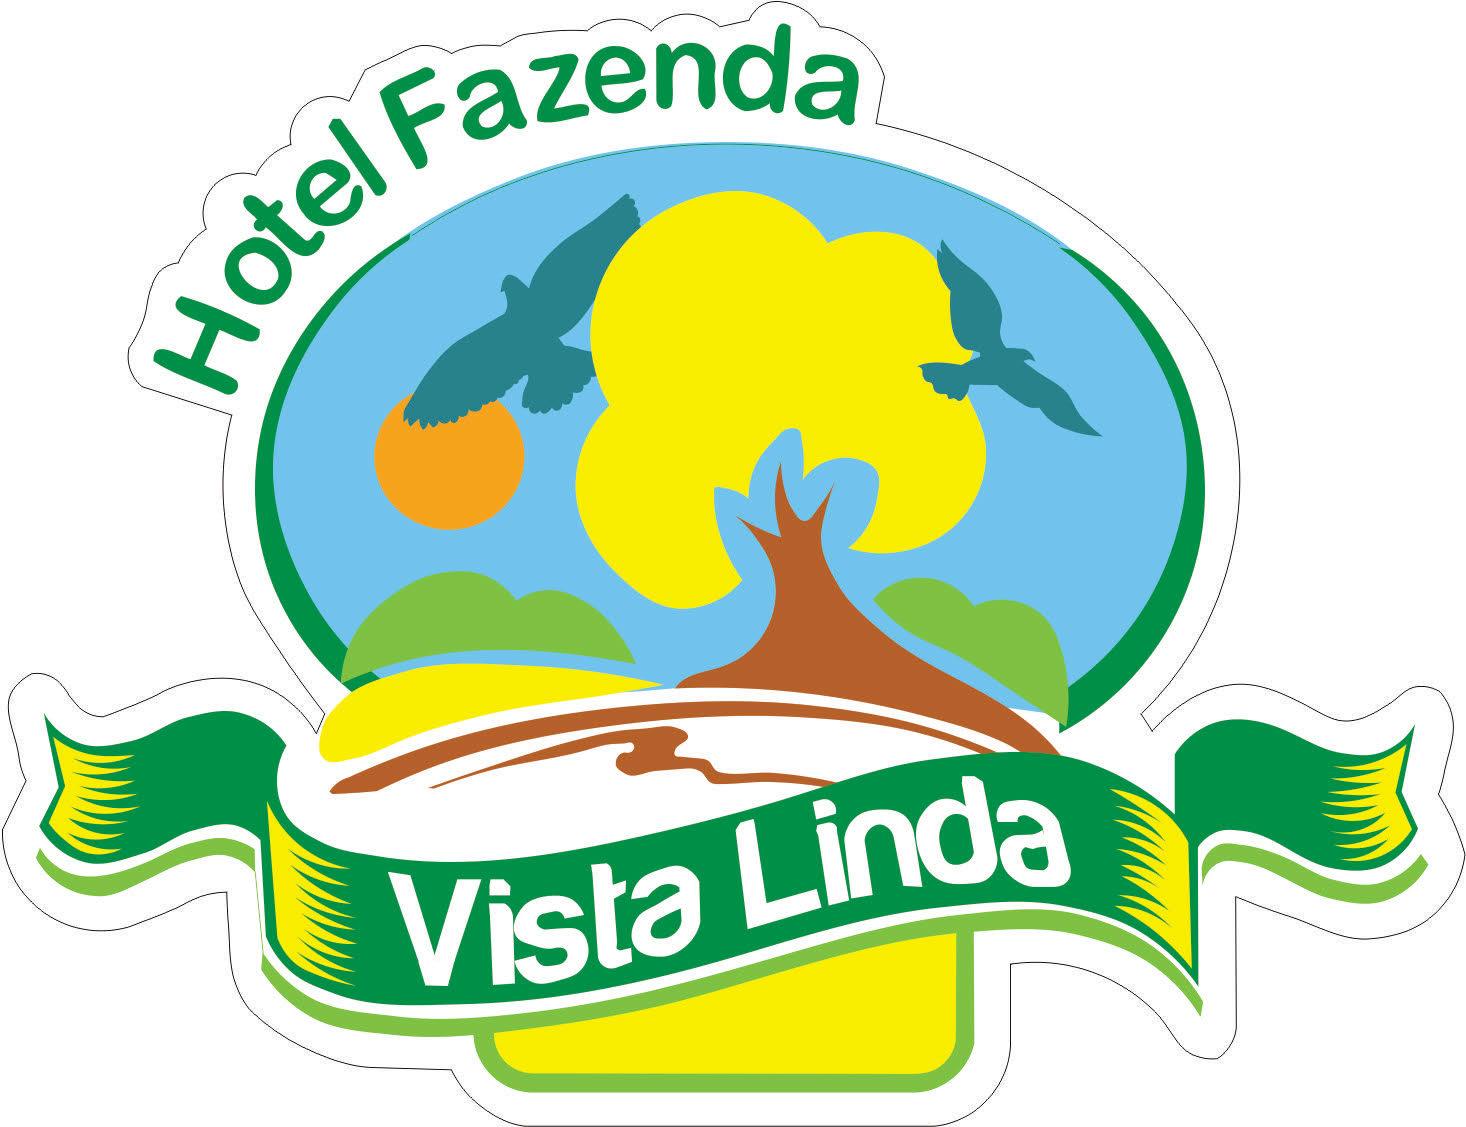 HOTEL FAZENDA VISTA LINDA